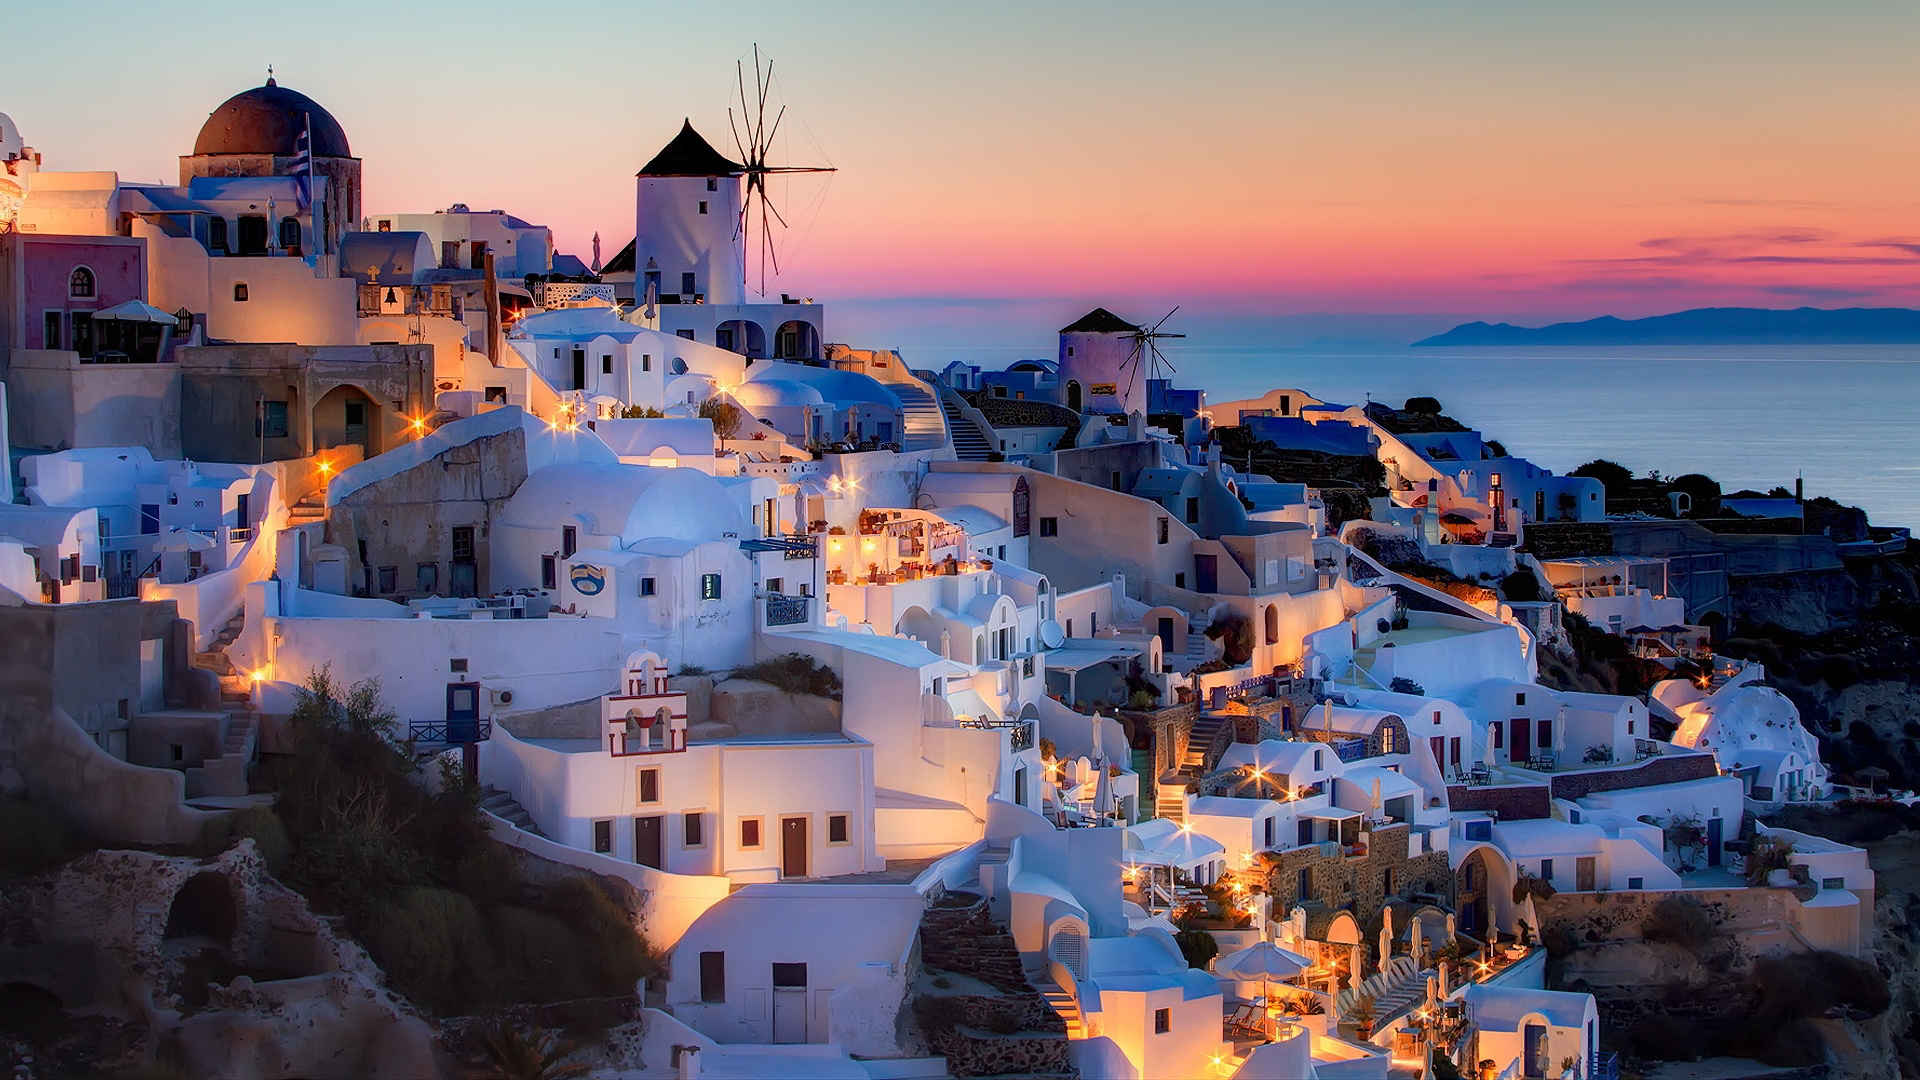 Elea Suites | Oia Santorini | Tel 22860 72099 | Email: info@elearesort.gr MHTE 1167K113K0997400 Follow us.